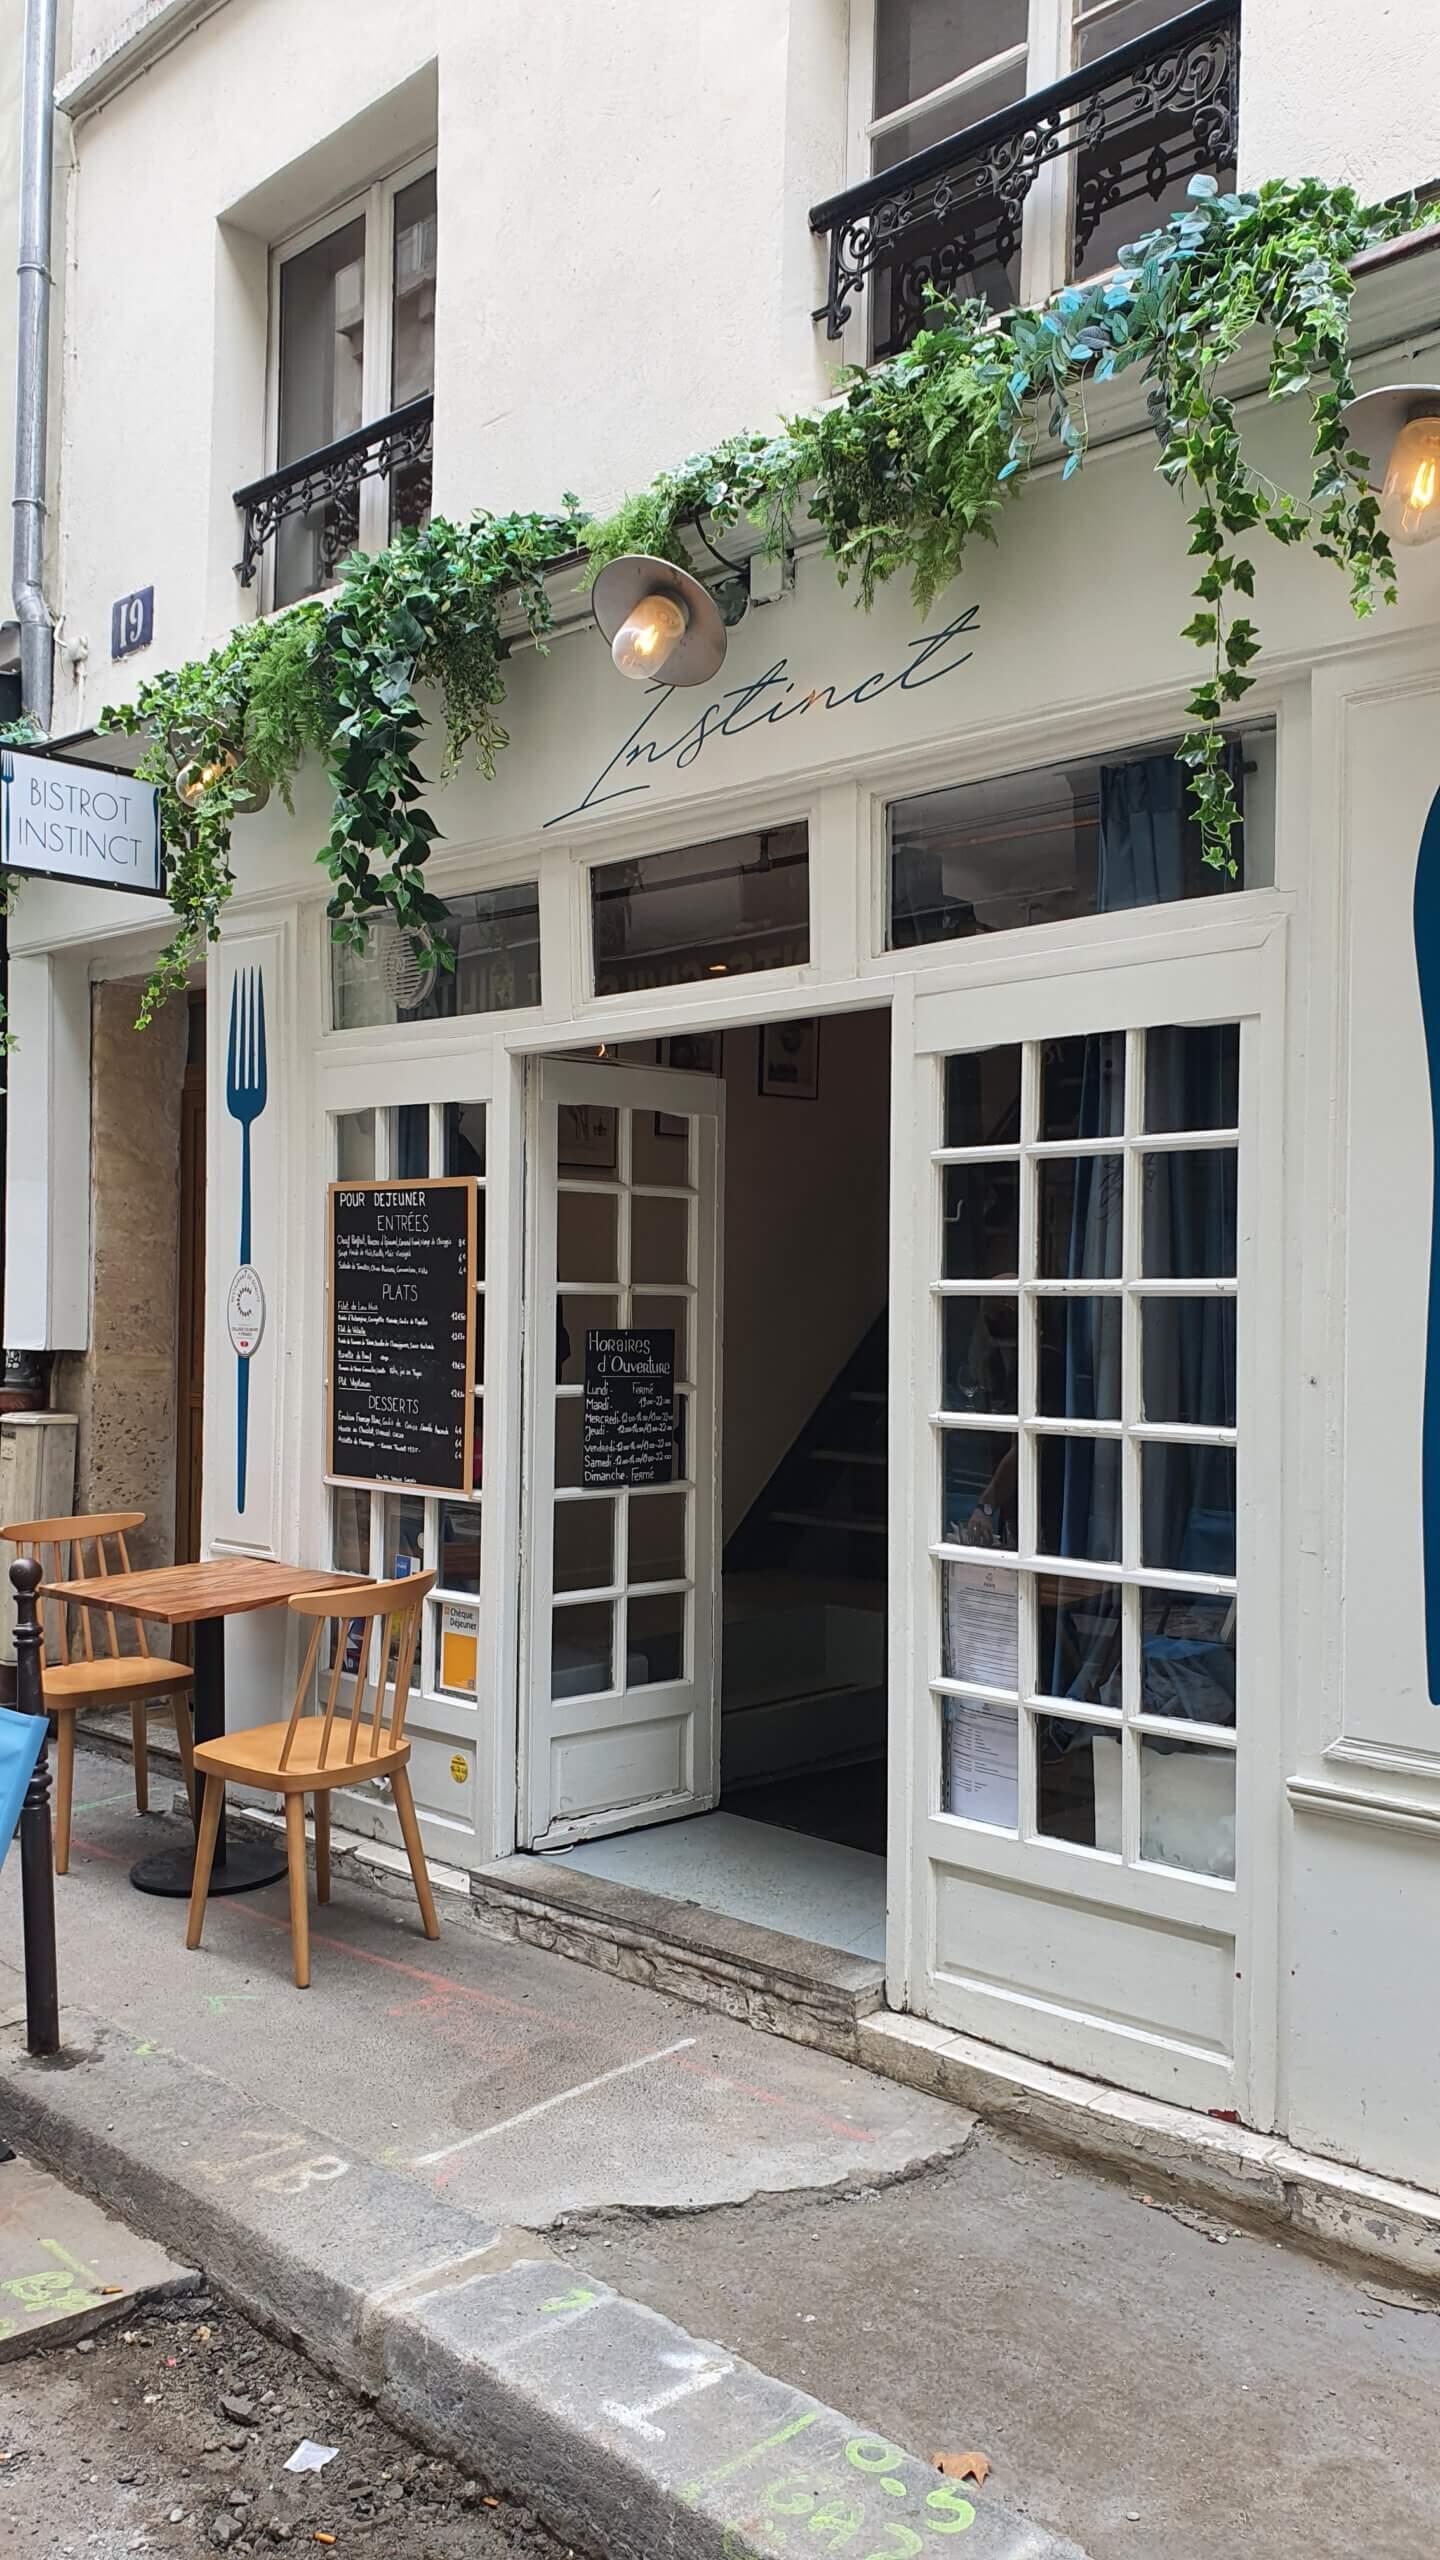 Bistrot Instinct Paris